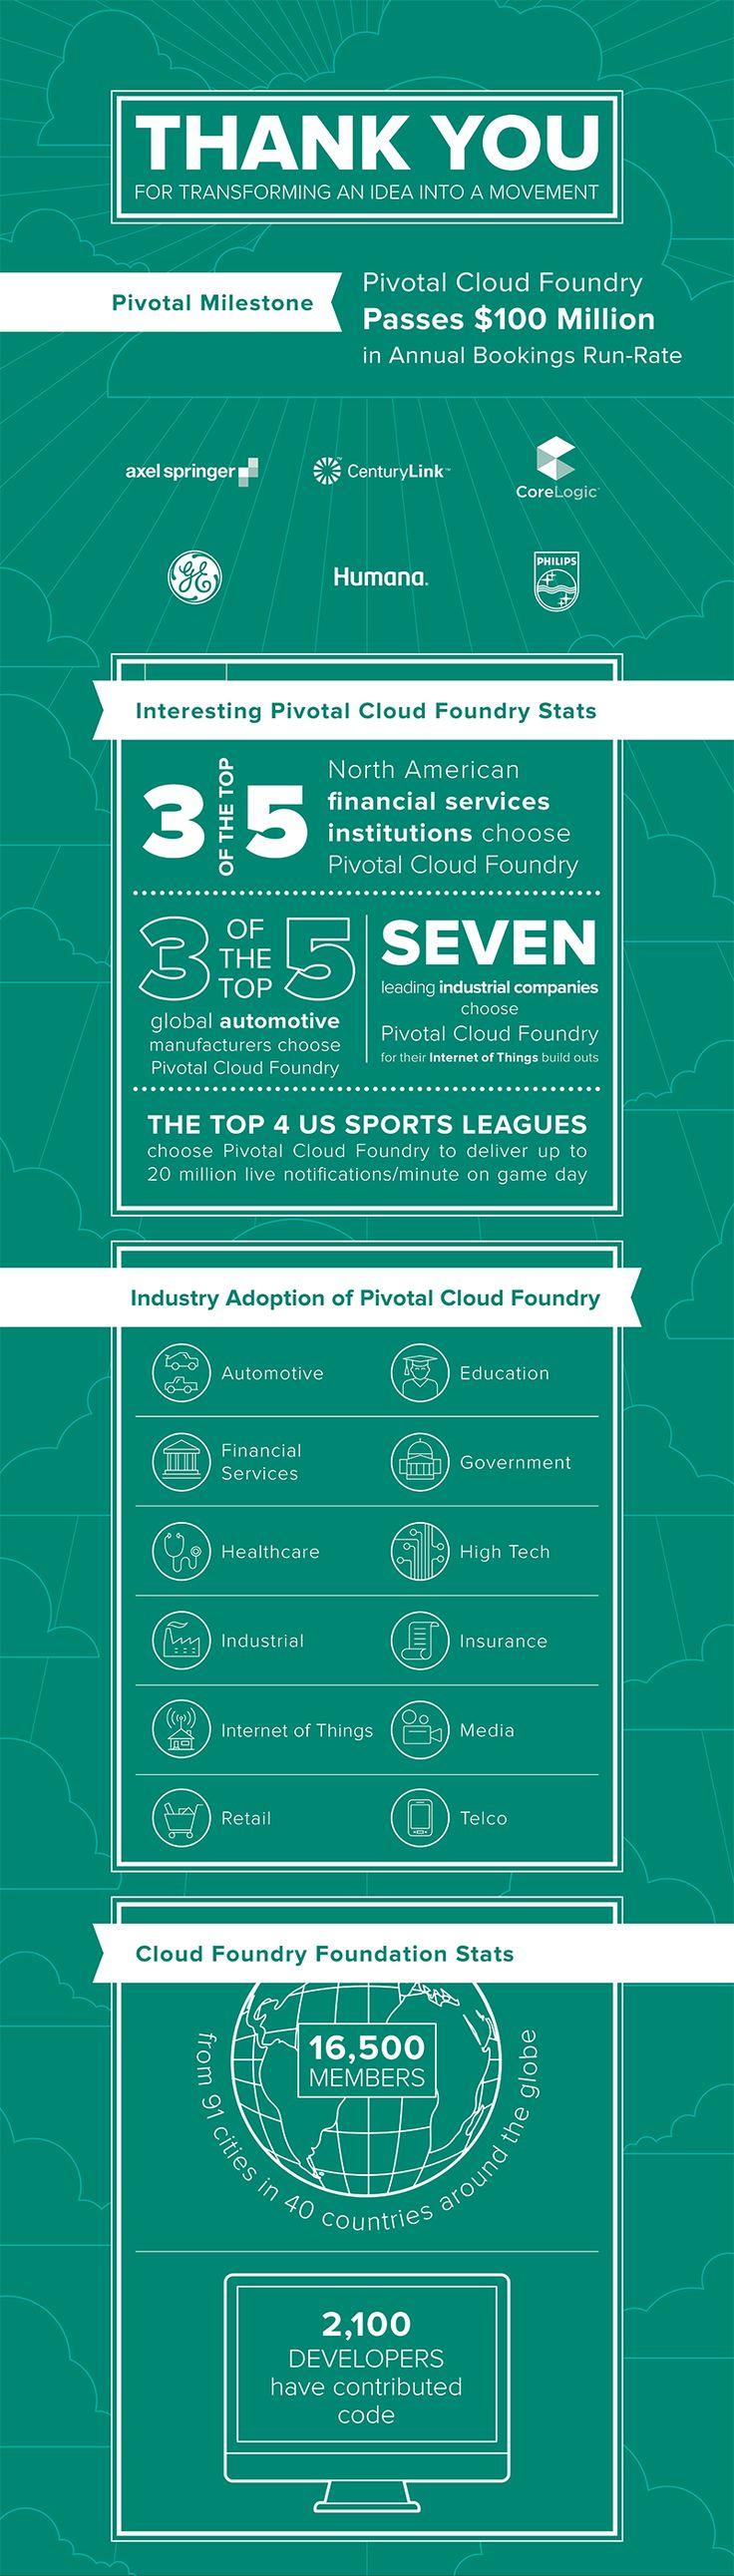 Pivotal Cloud Foundry Hits $100 Million